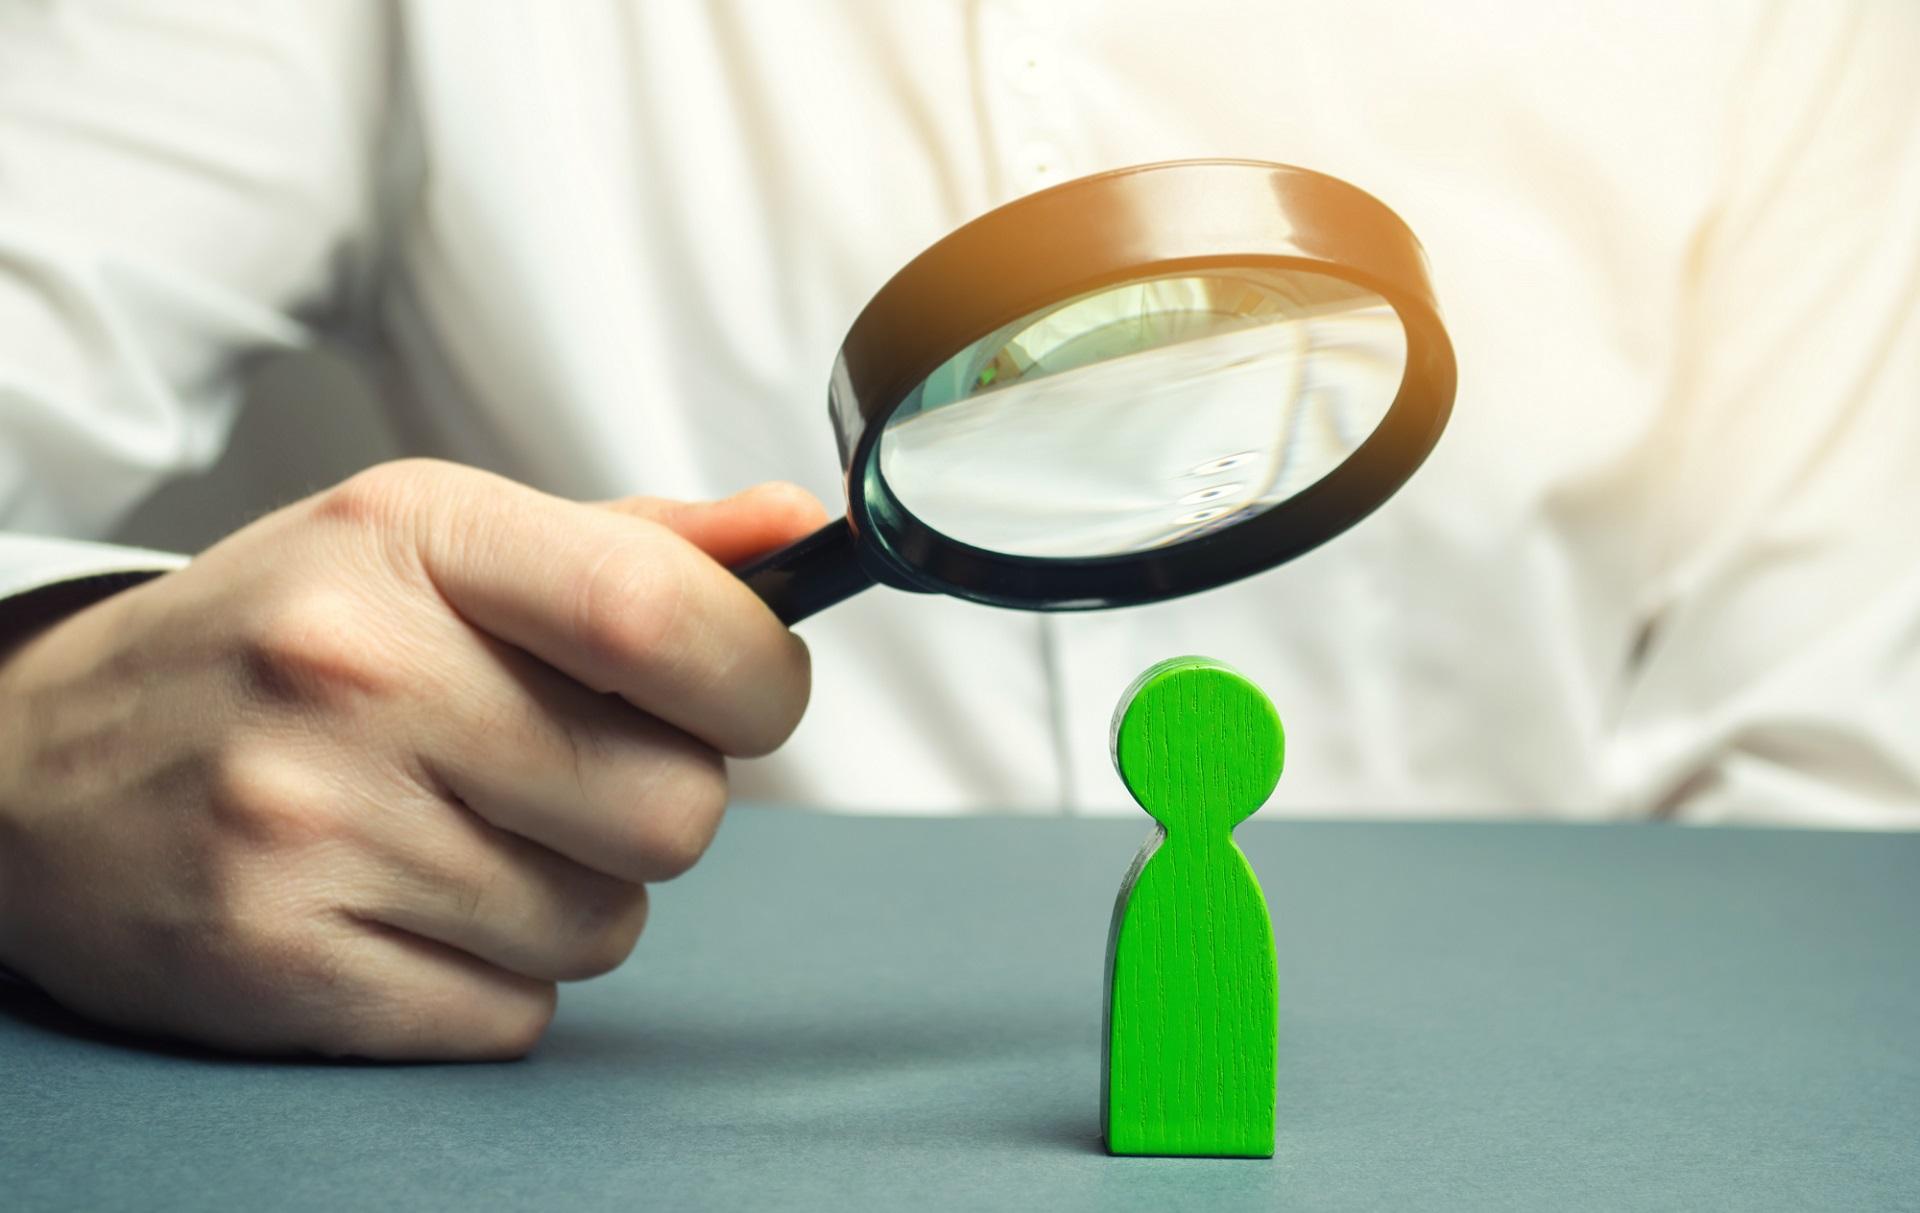 Identifying website visitors